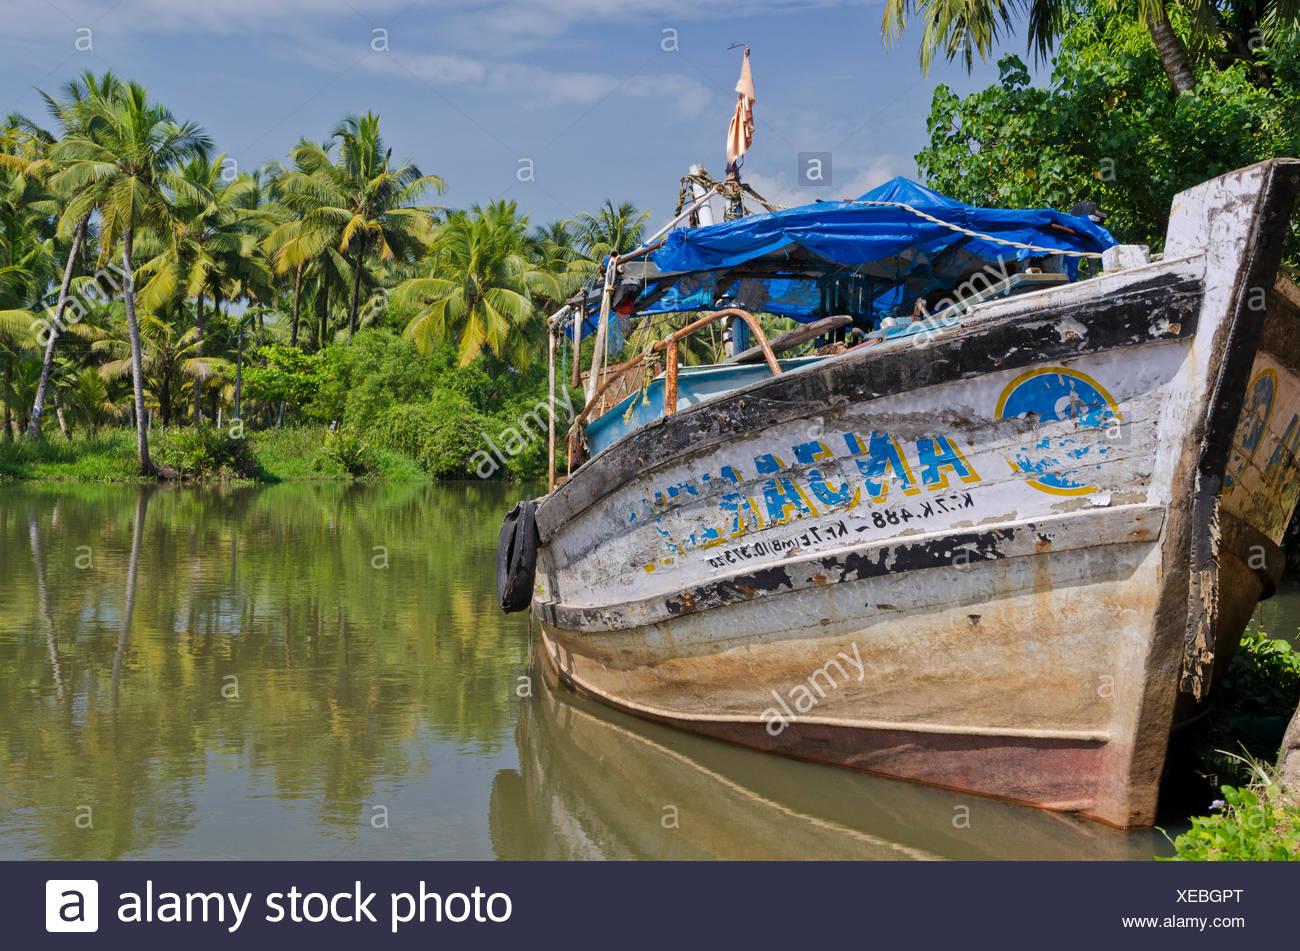 Fishing boat, backwaters, Kerala, India, Asia - Stock Image